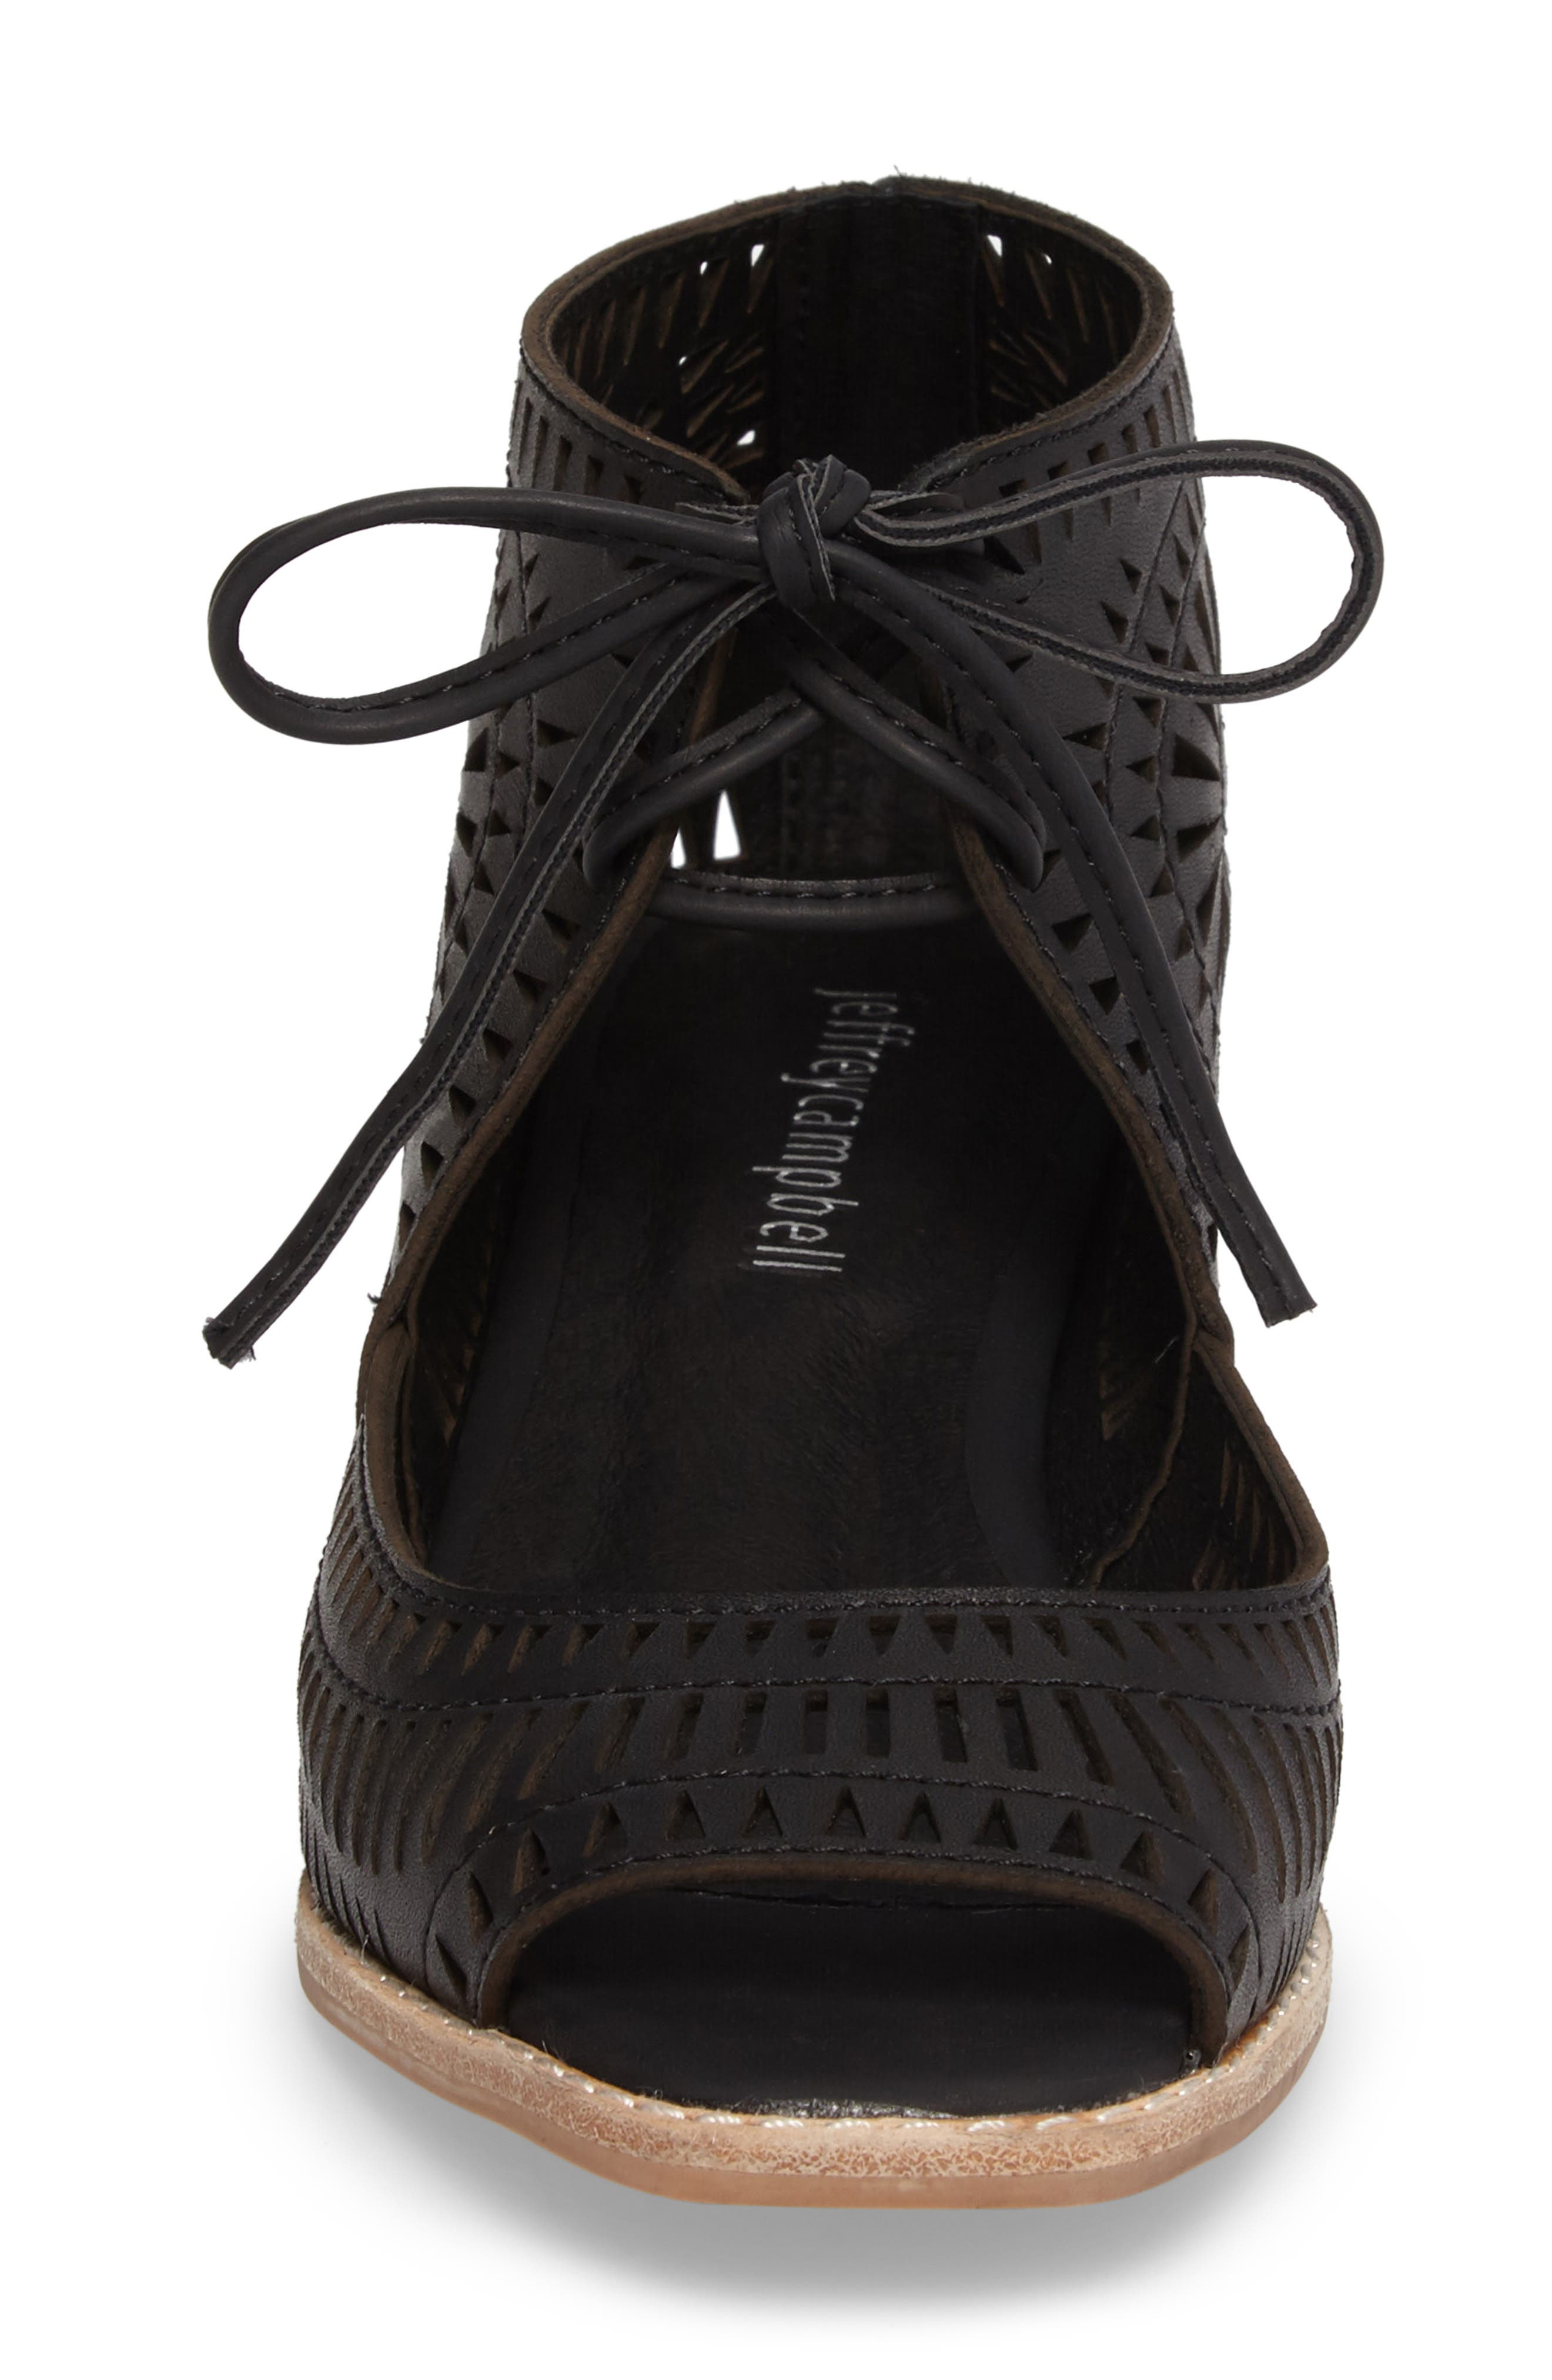 Rayos Perforated Wedge Sandal,                             Alternate thumbnail 4, color,                             001